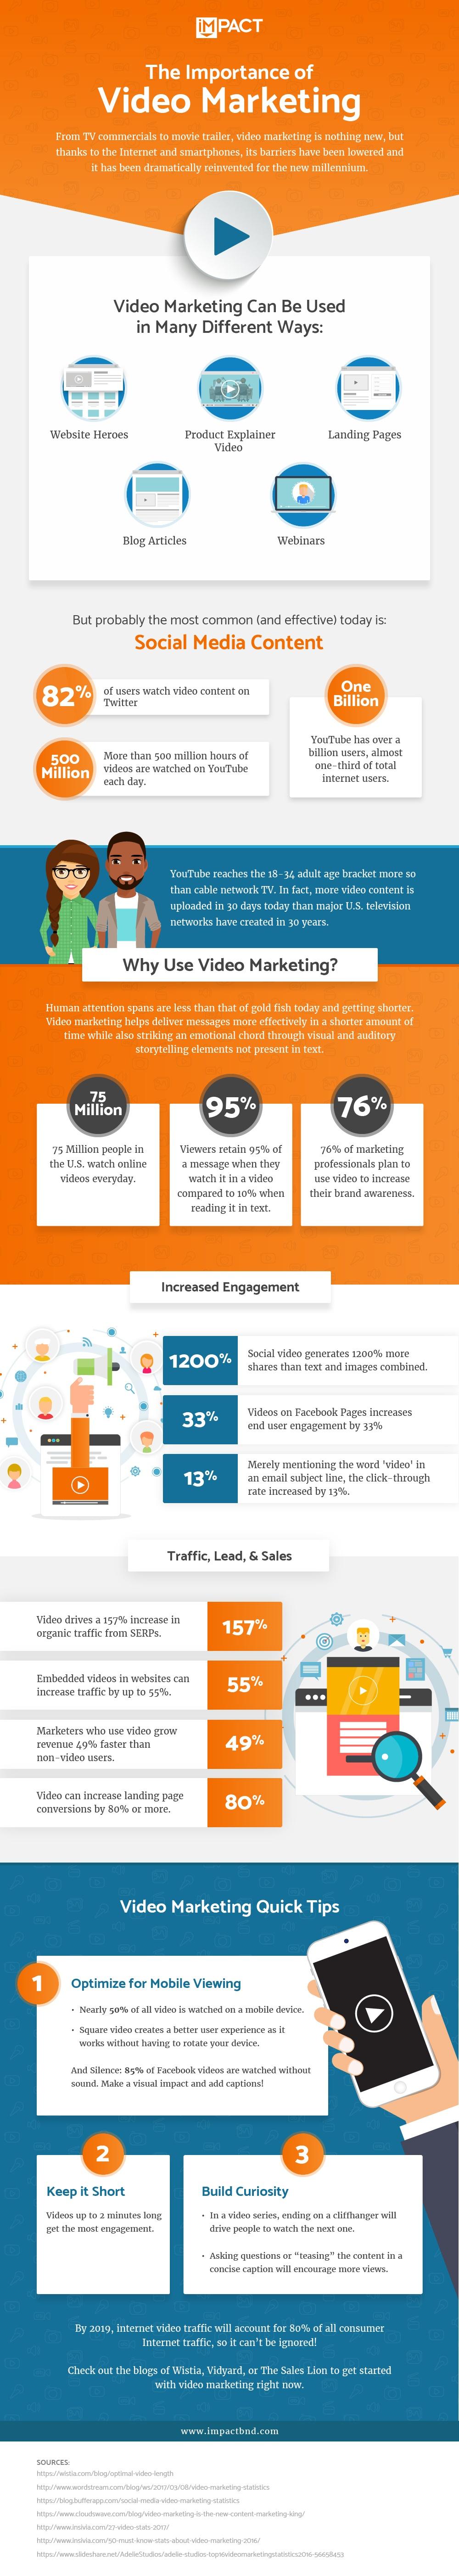 Video-Marketing-Infographic.jpg